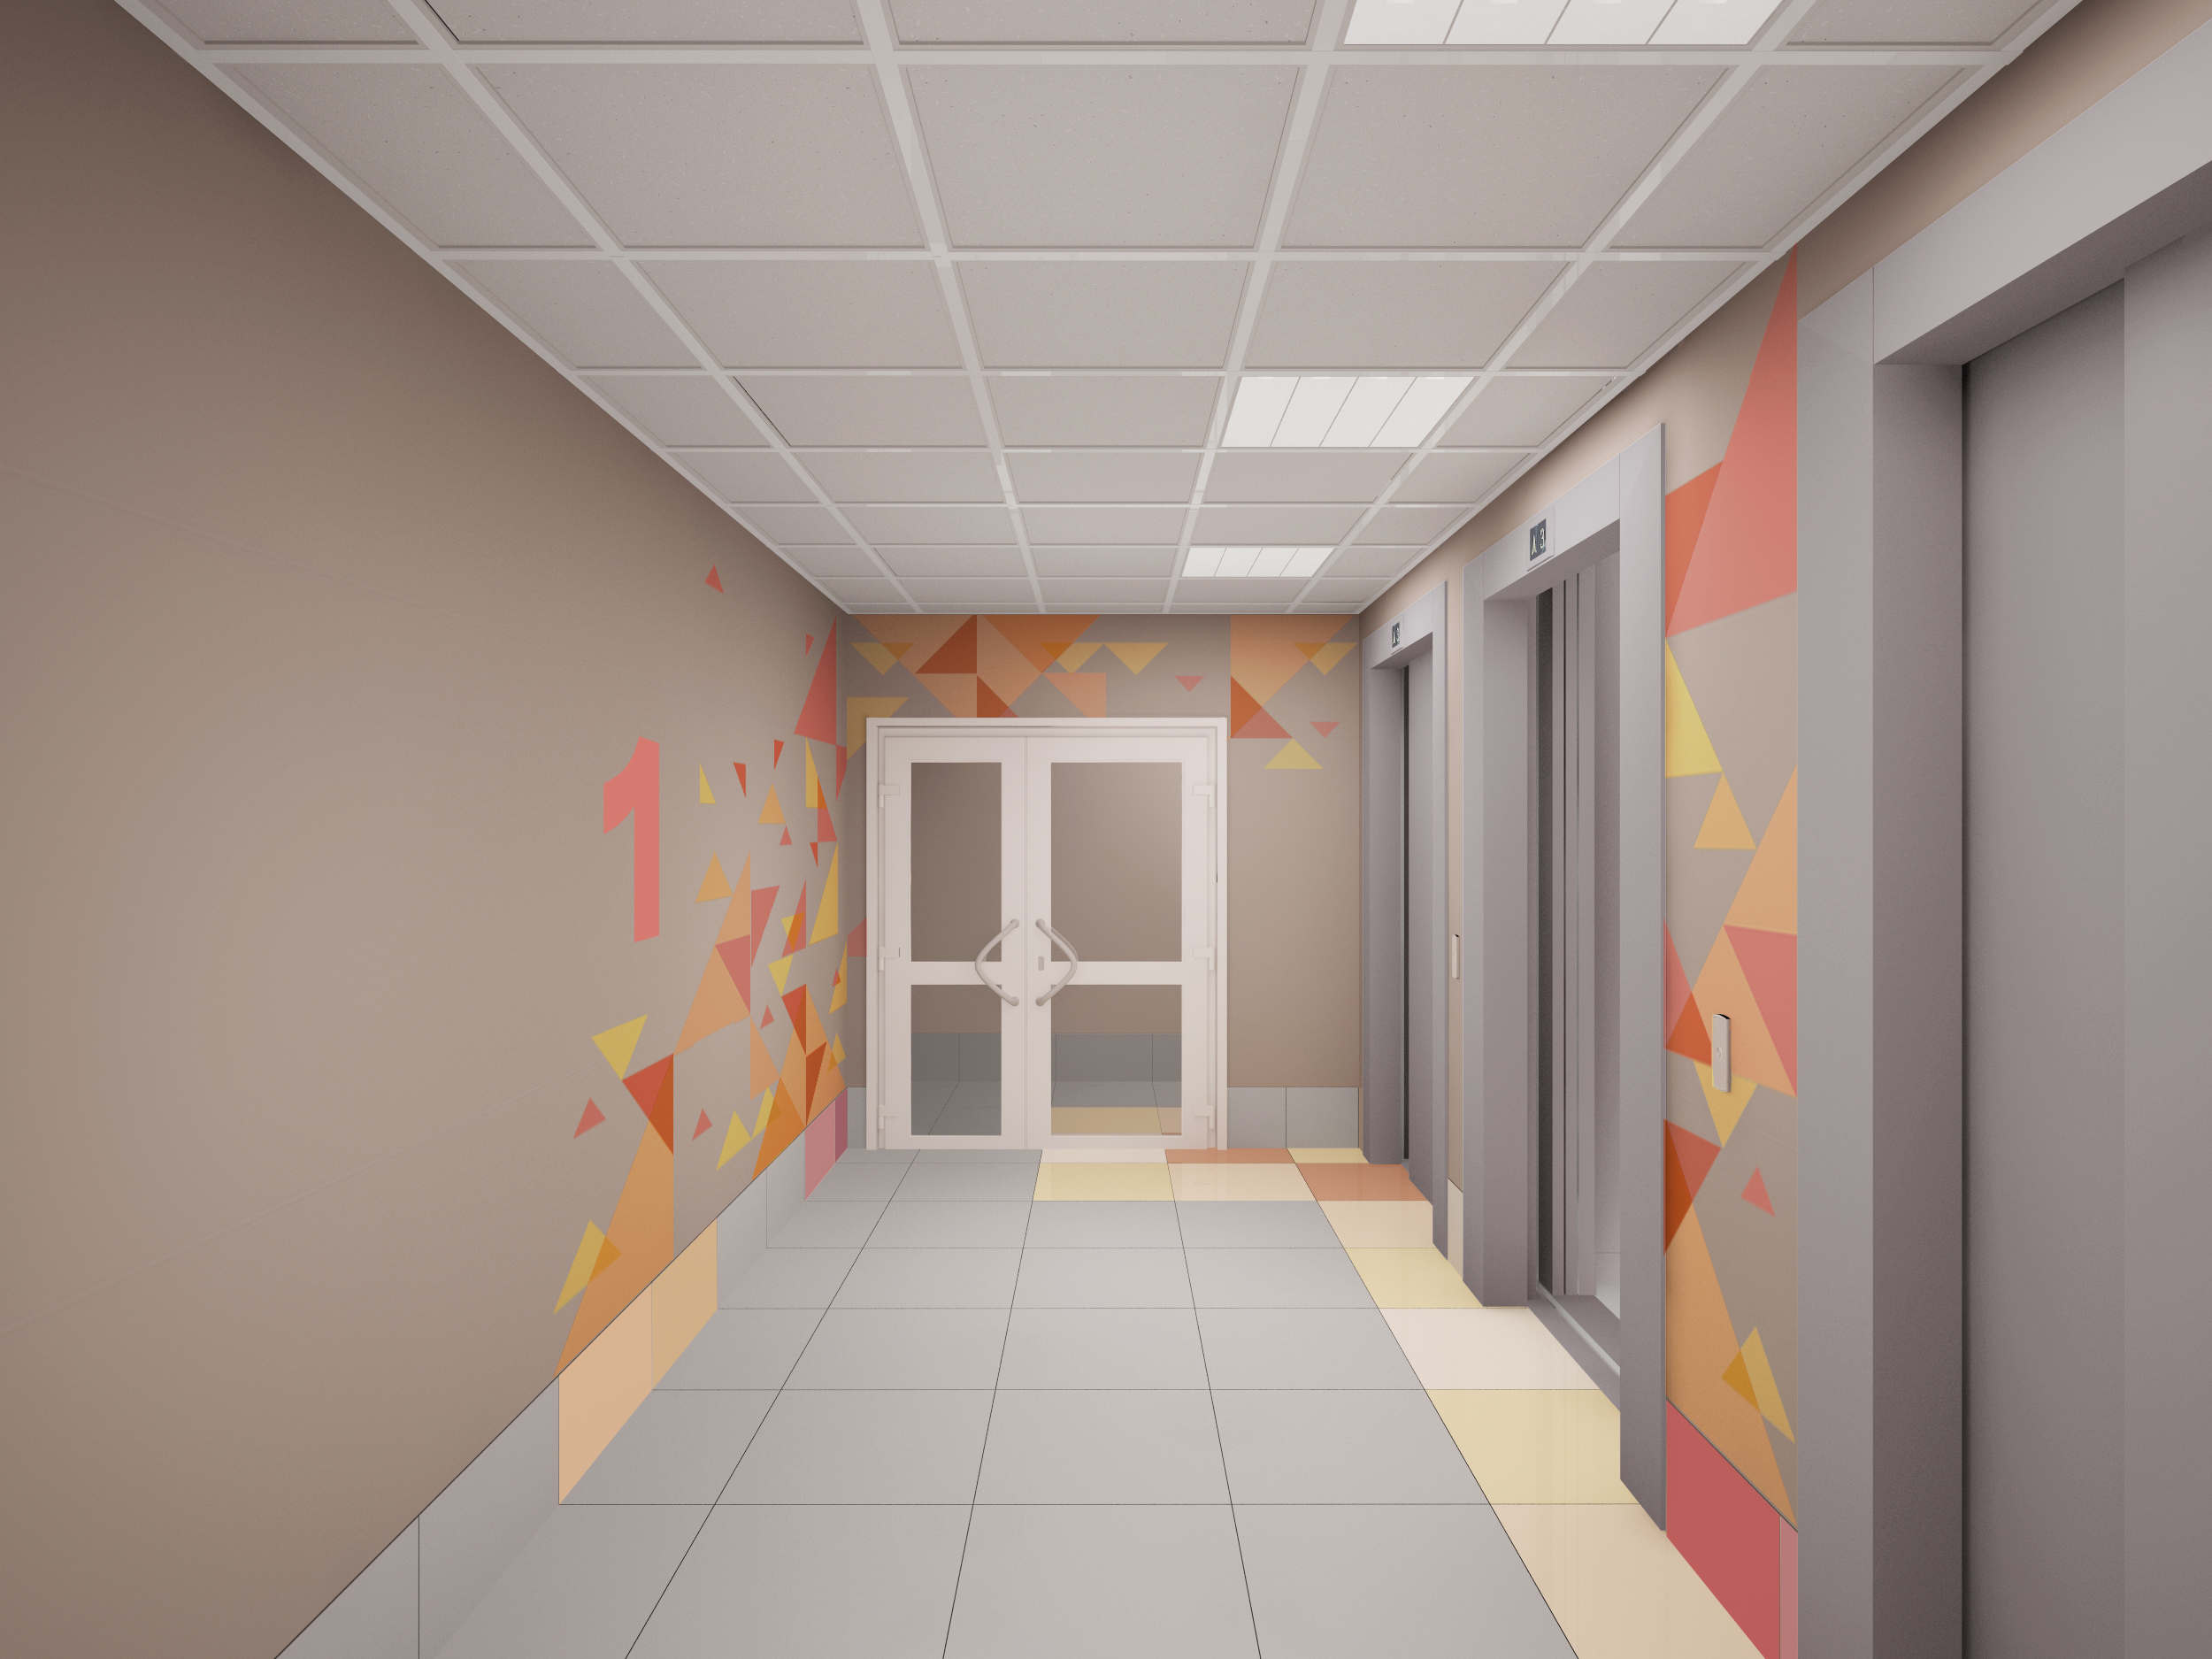 лифт2.jpg